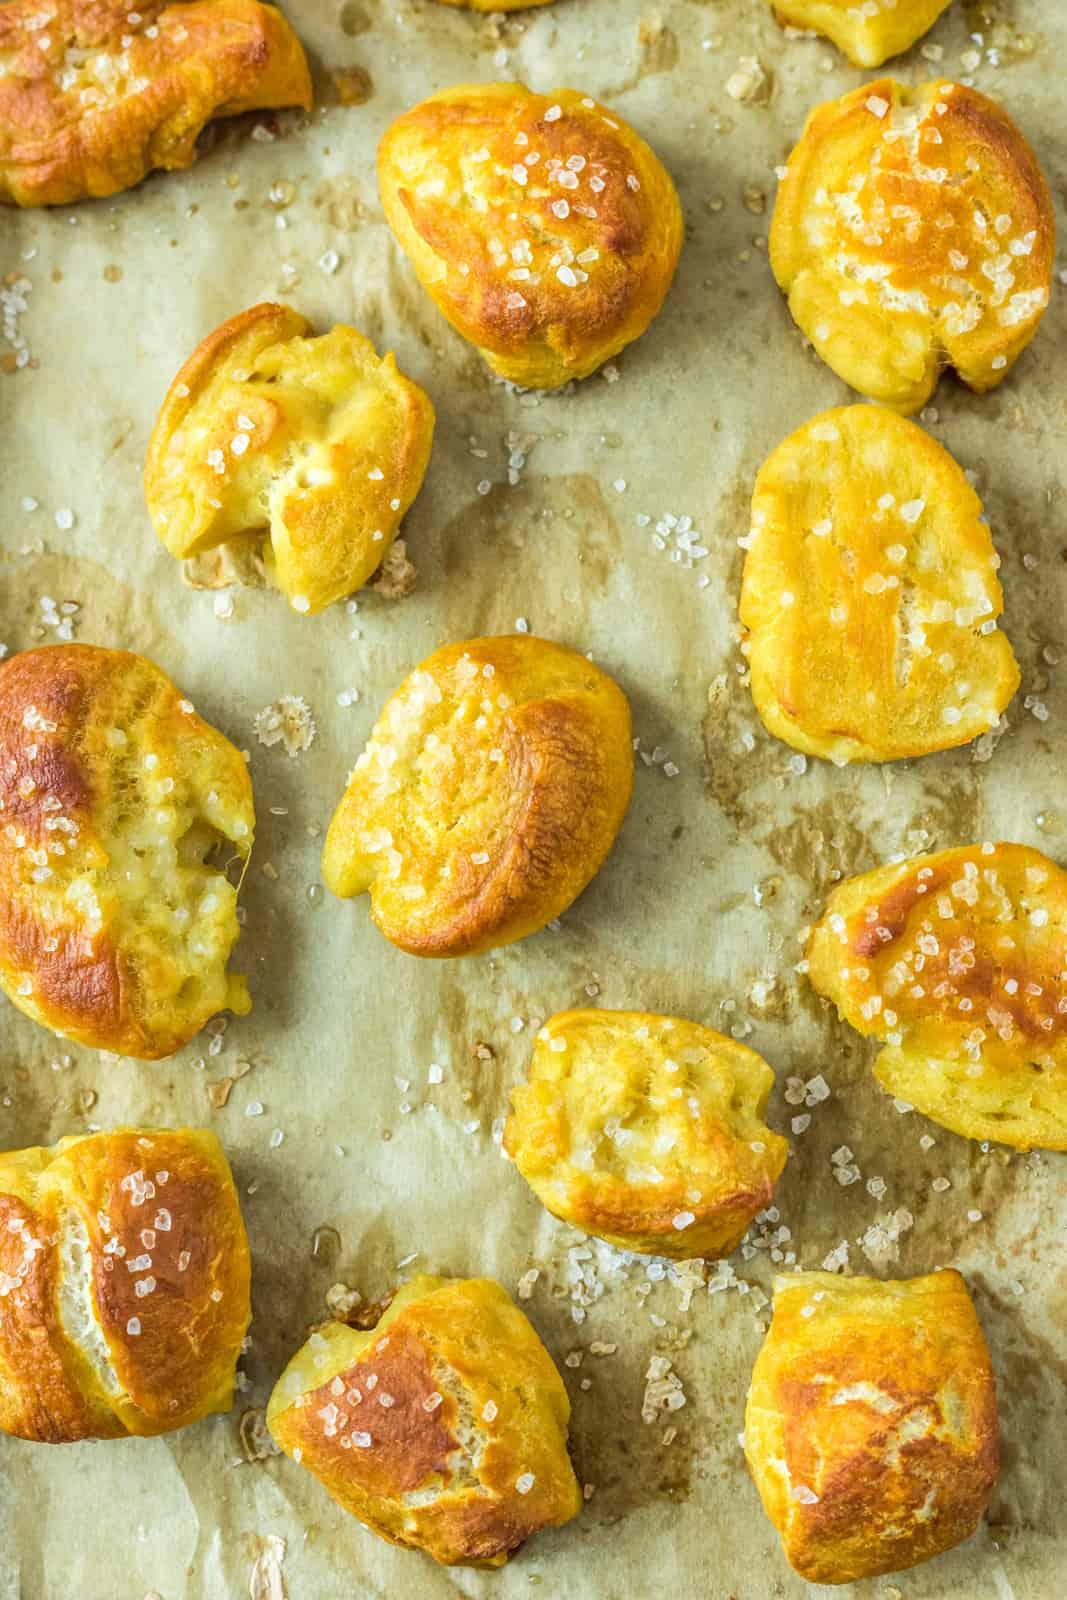 Close up of pretzels on baking sheet